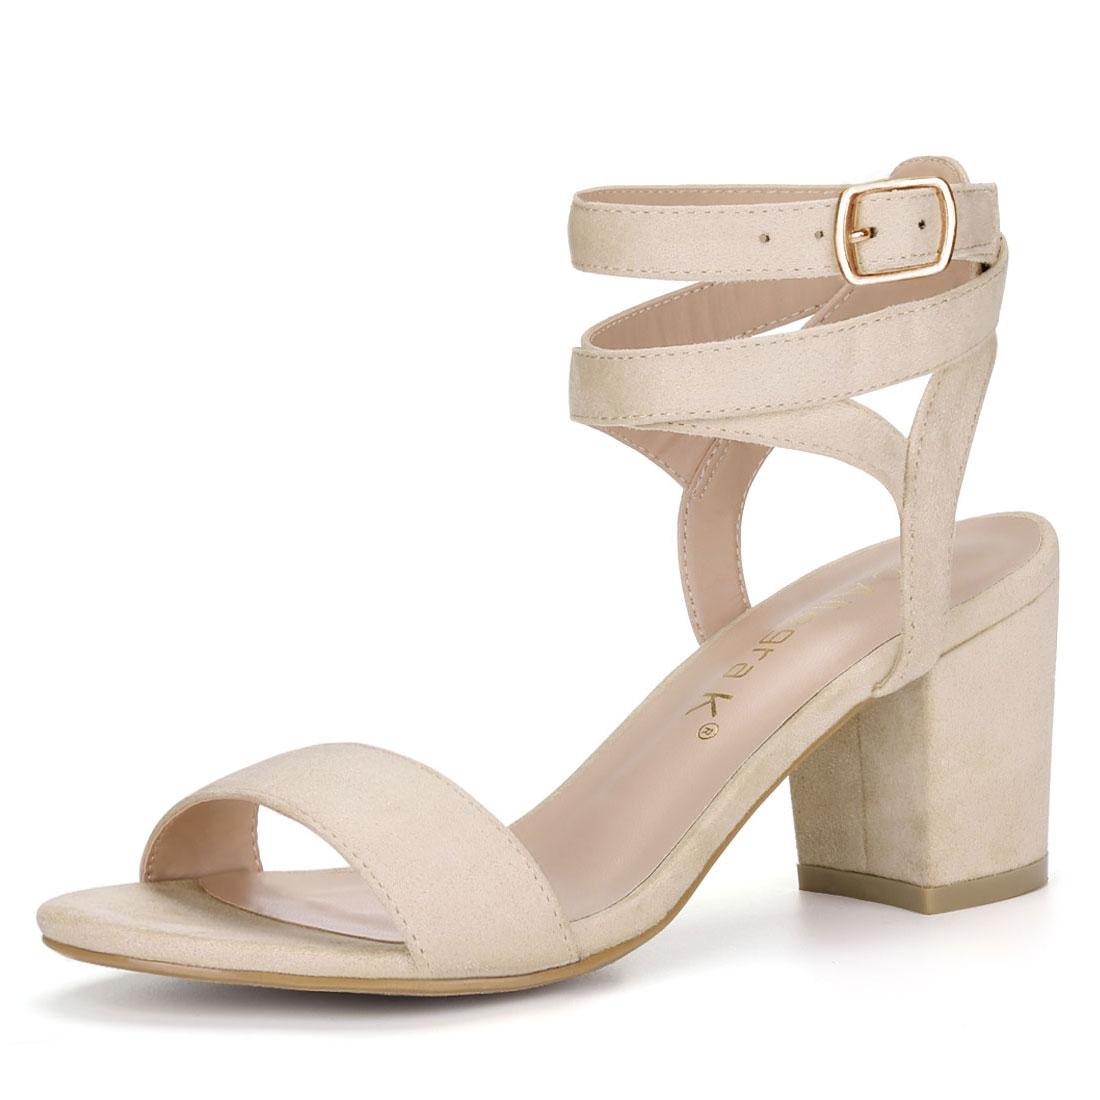 Allegra K Women's Block Heels Double Ankle Straps Sandals BeigeUS 7